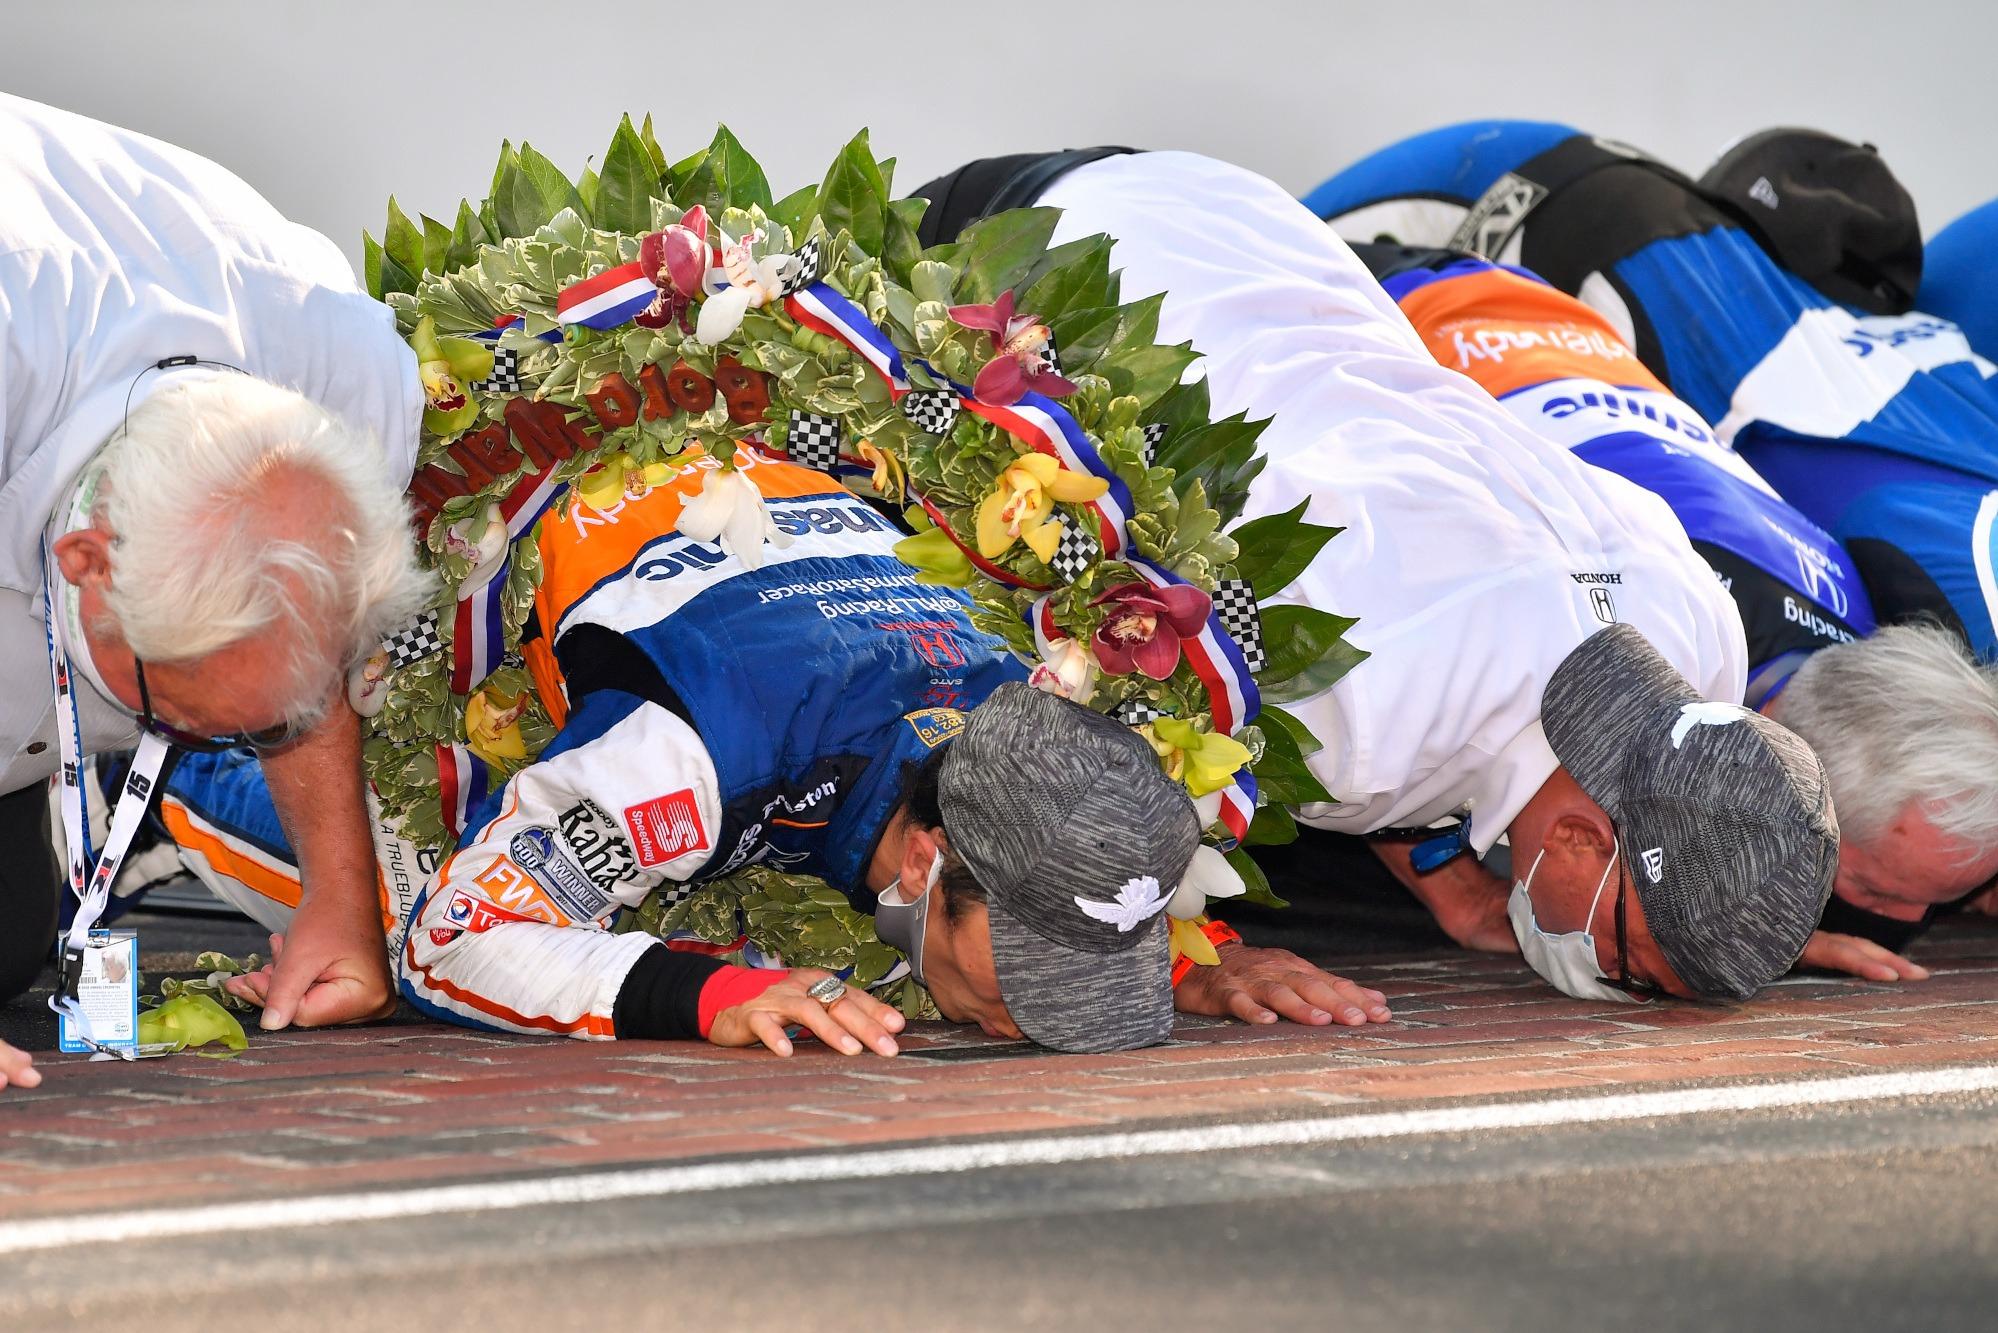 Takuma Sato and his RLL team kiss the bricks after winning the 2020 Indy 500